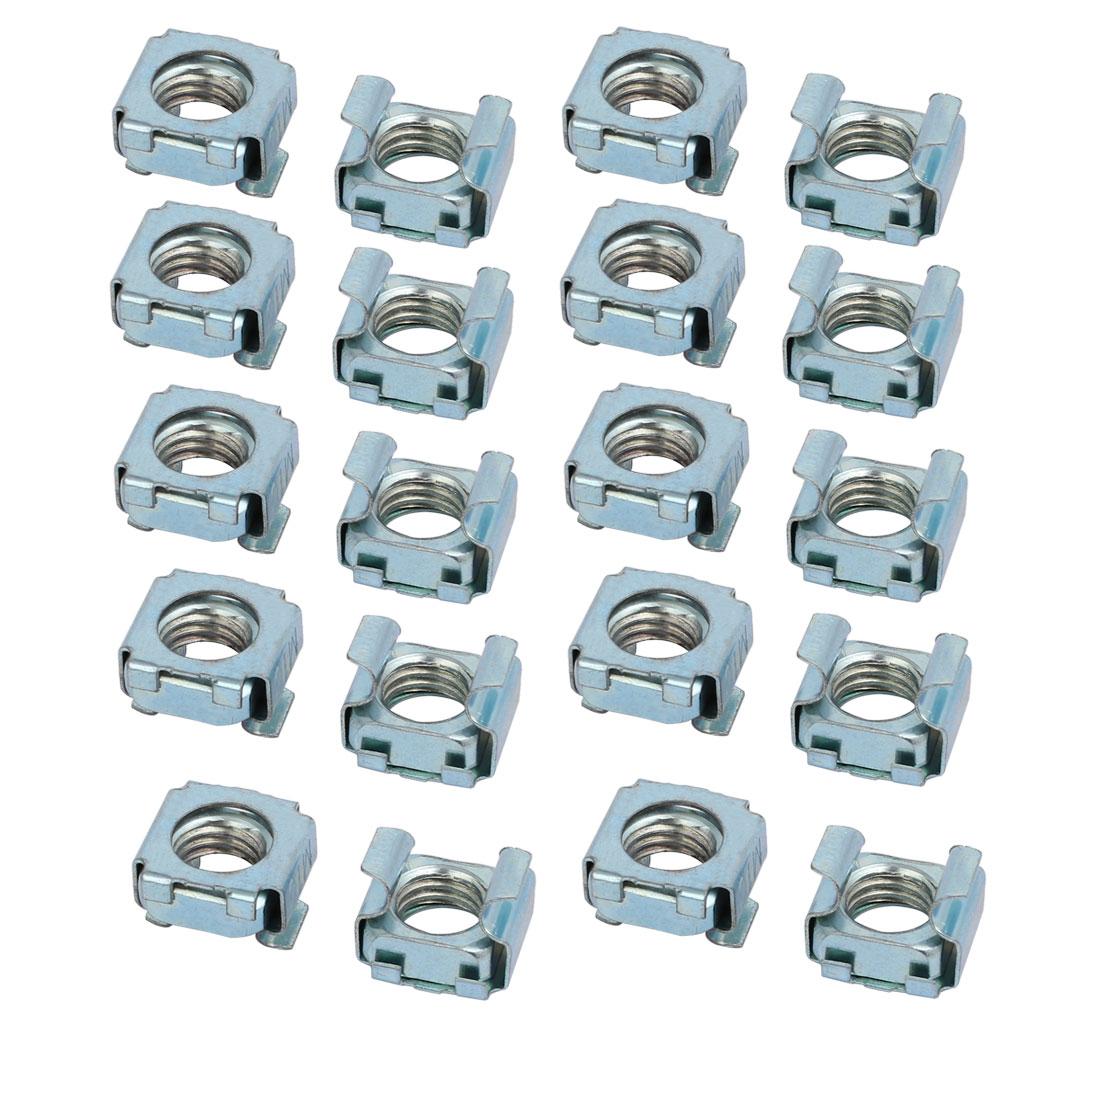 20pcs M10 Carbon Steel Captive Cage Nut Silver Blue for Server Shelf Cabinet